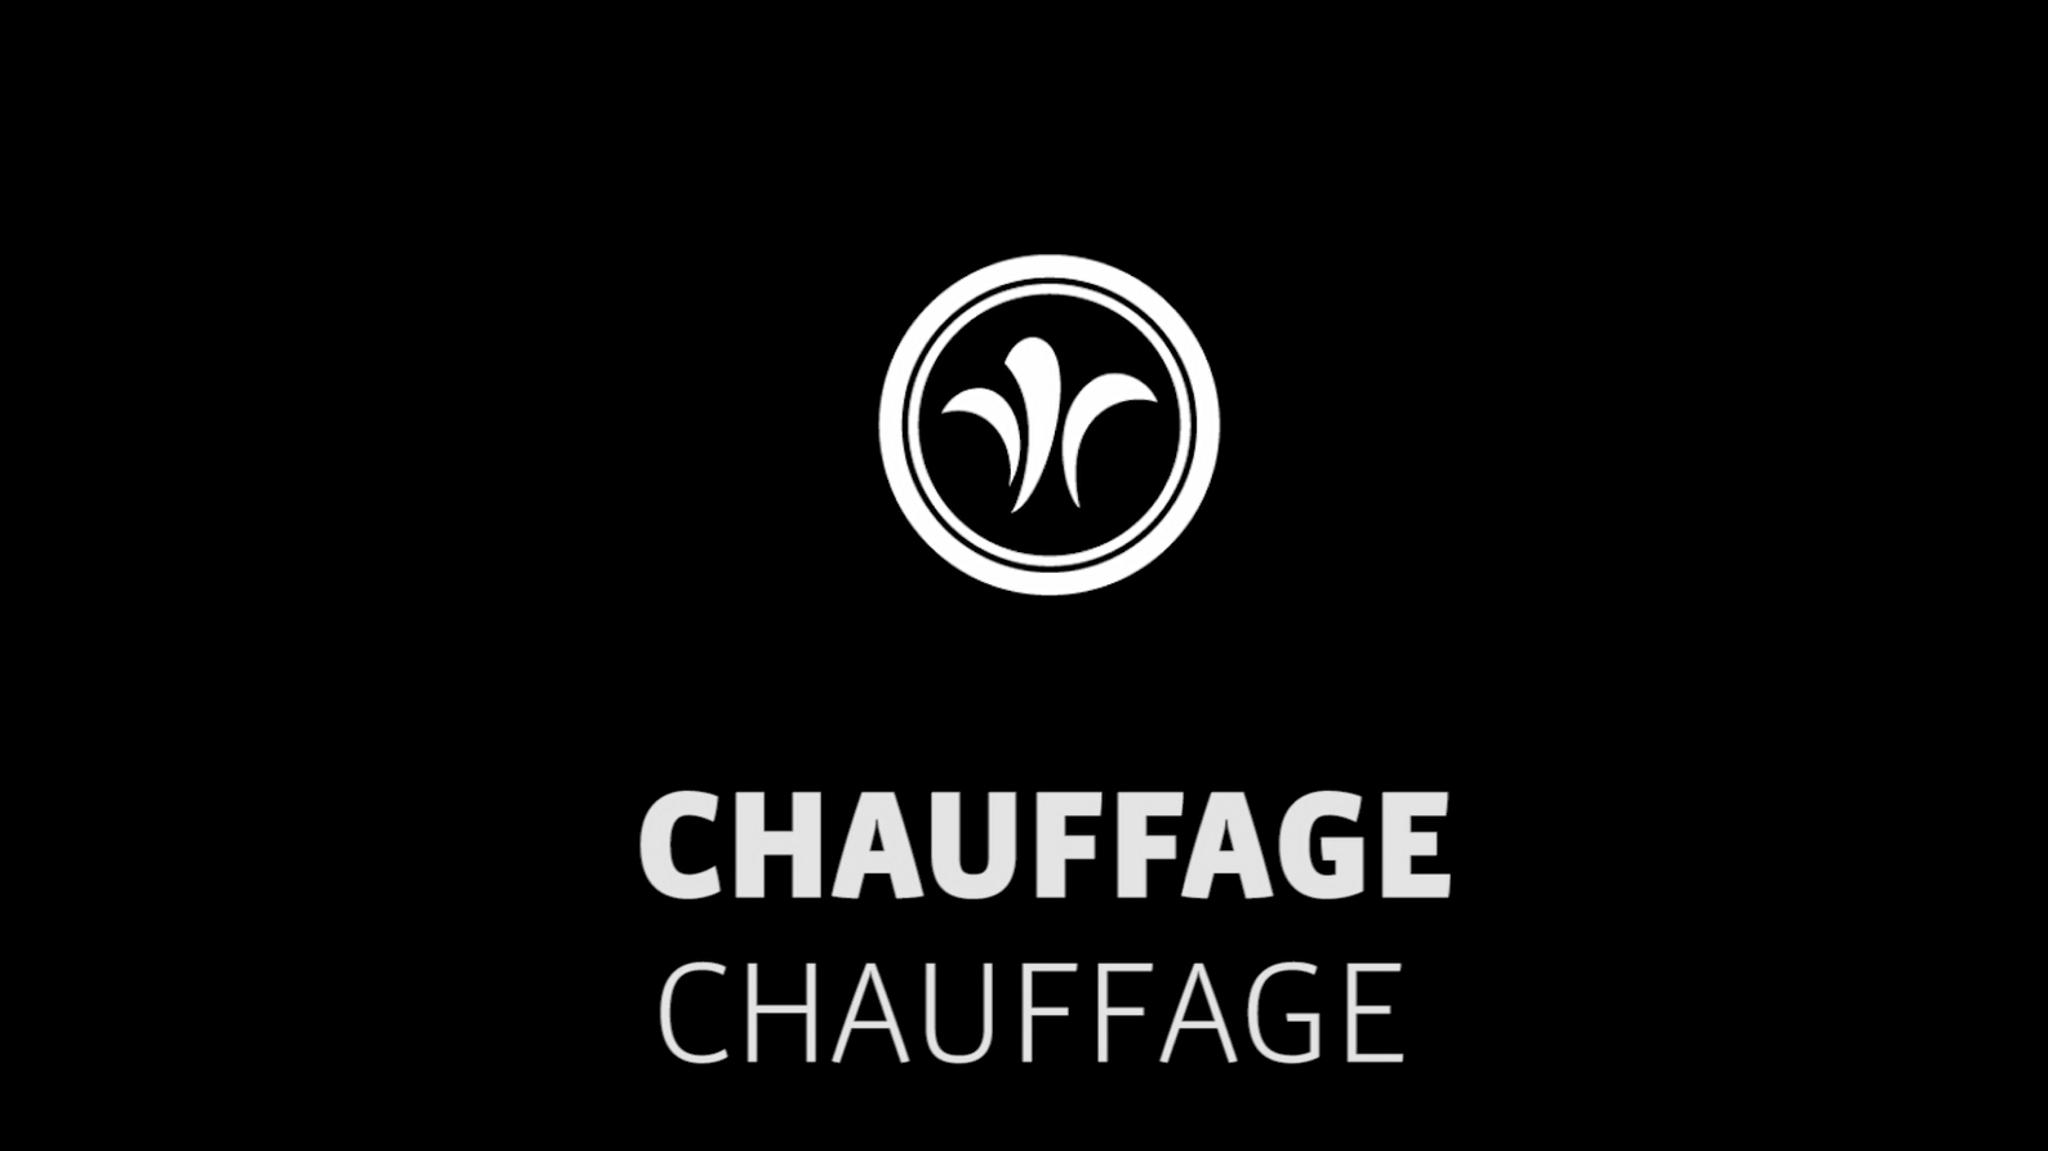 Chauffage pour camping-car // Niesmann+Bischoff - camping-car de luxe (modèle FLAIR) // 2019 // H2